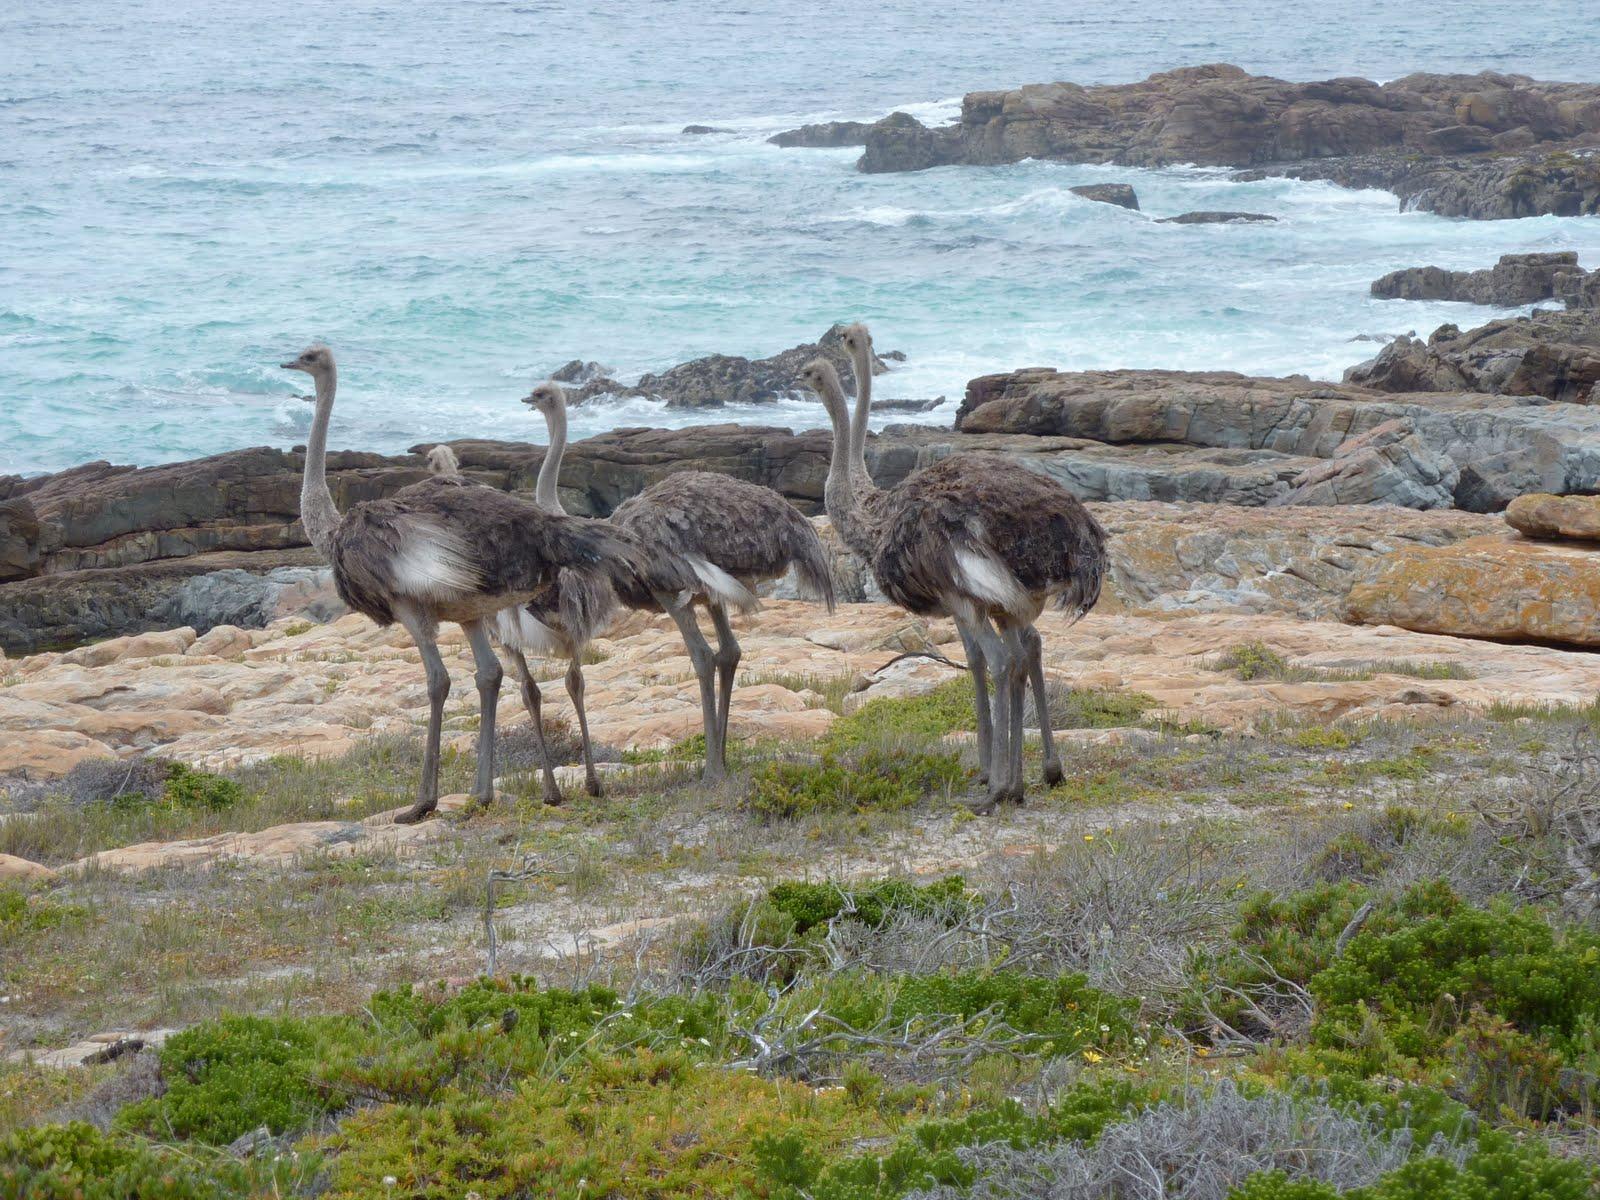 Reise-Blogger: Reisebericht Südafrika: Kap der Guten Hoffnung